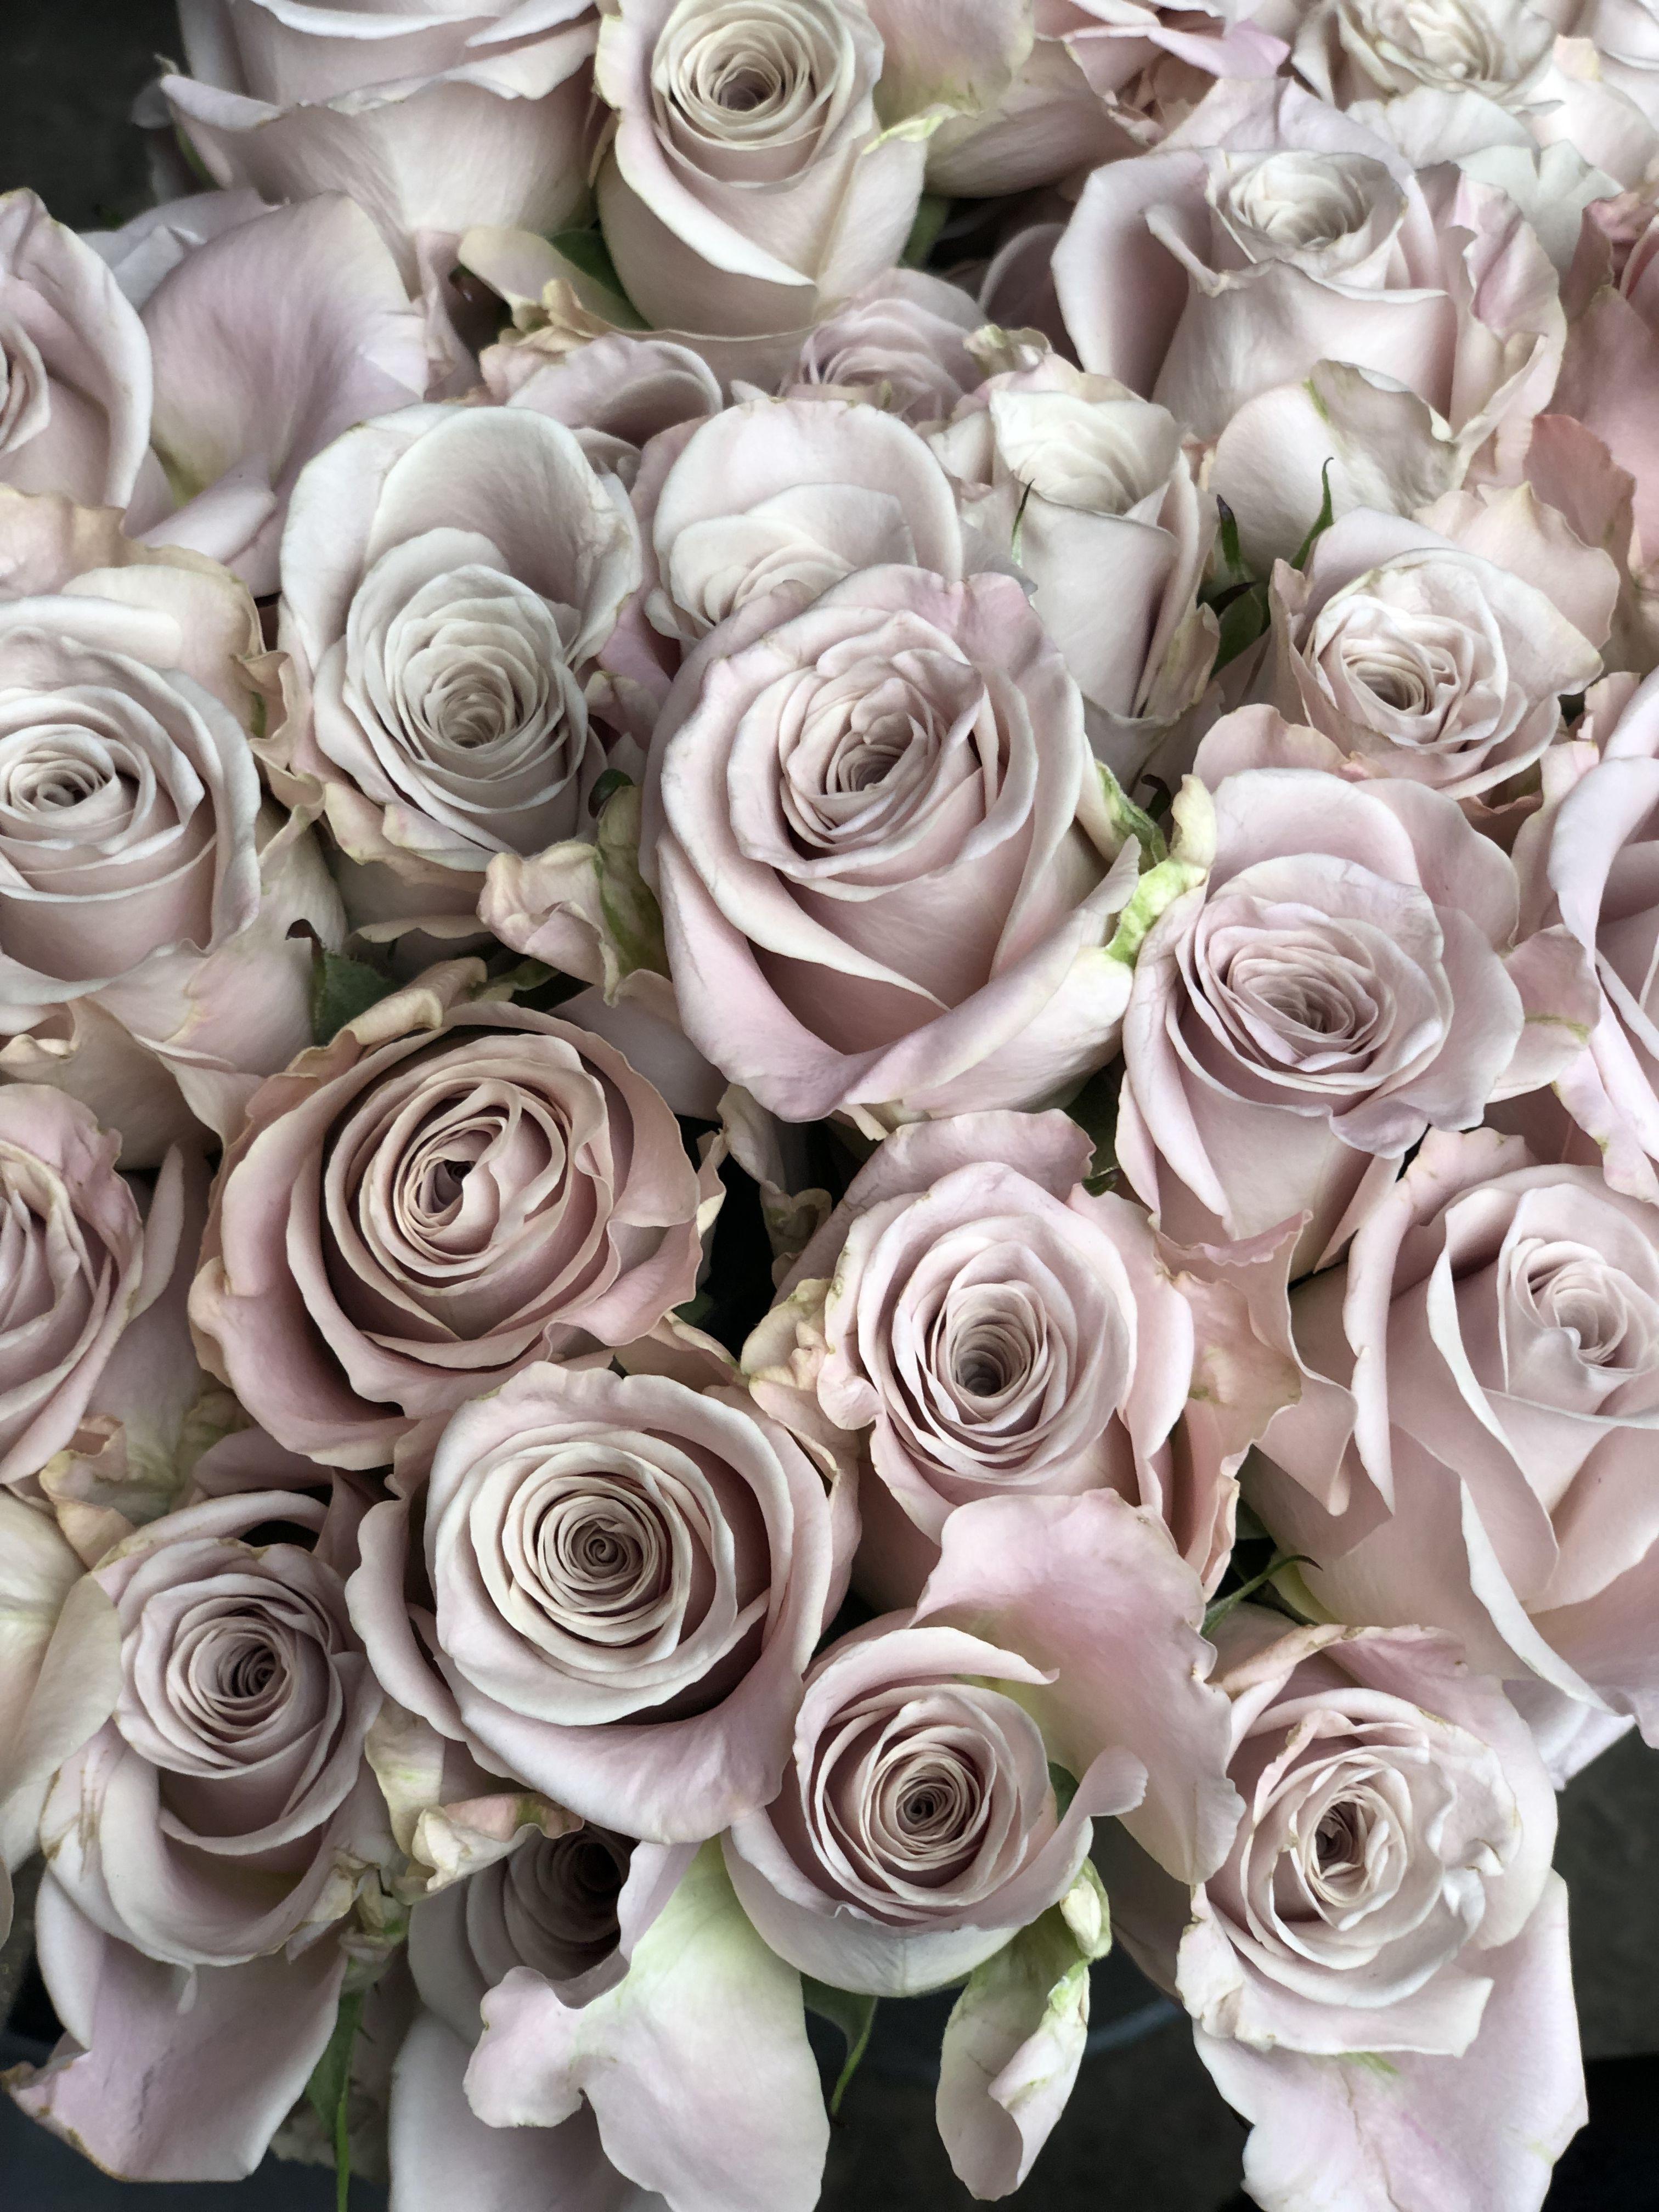 Wedding flower menta rose Цветы, Флористика, Работы